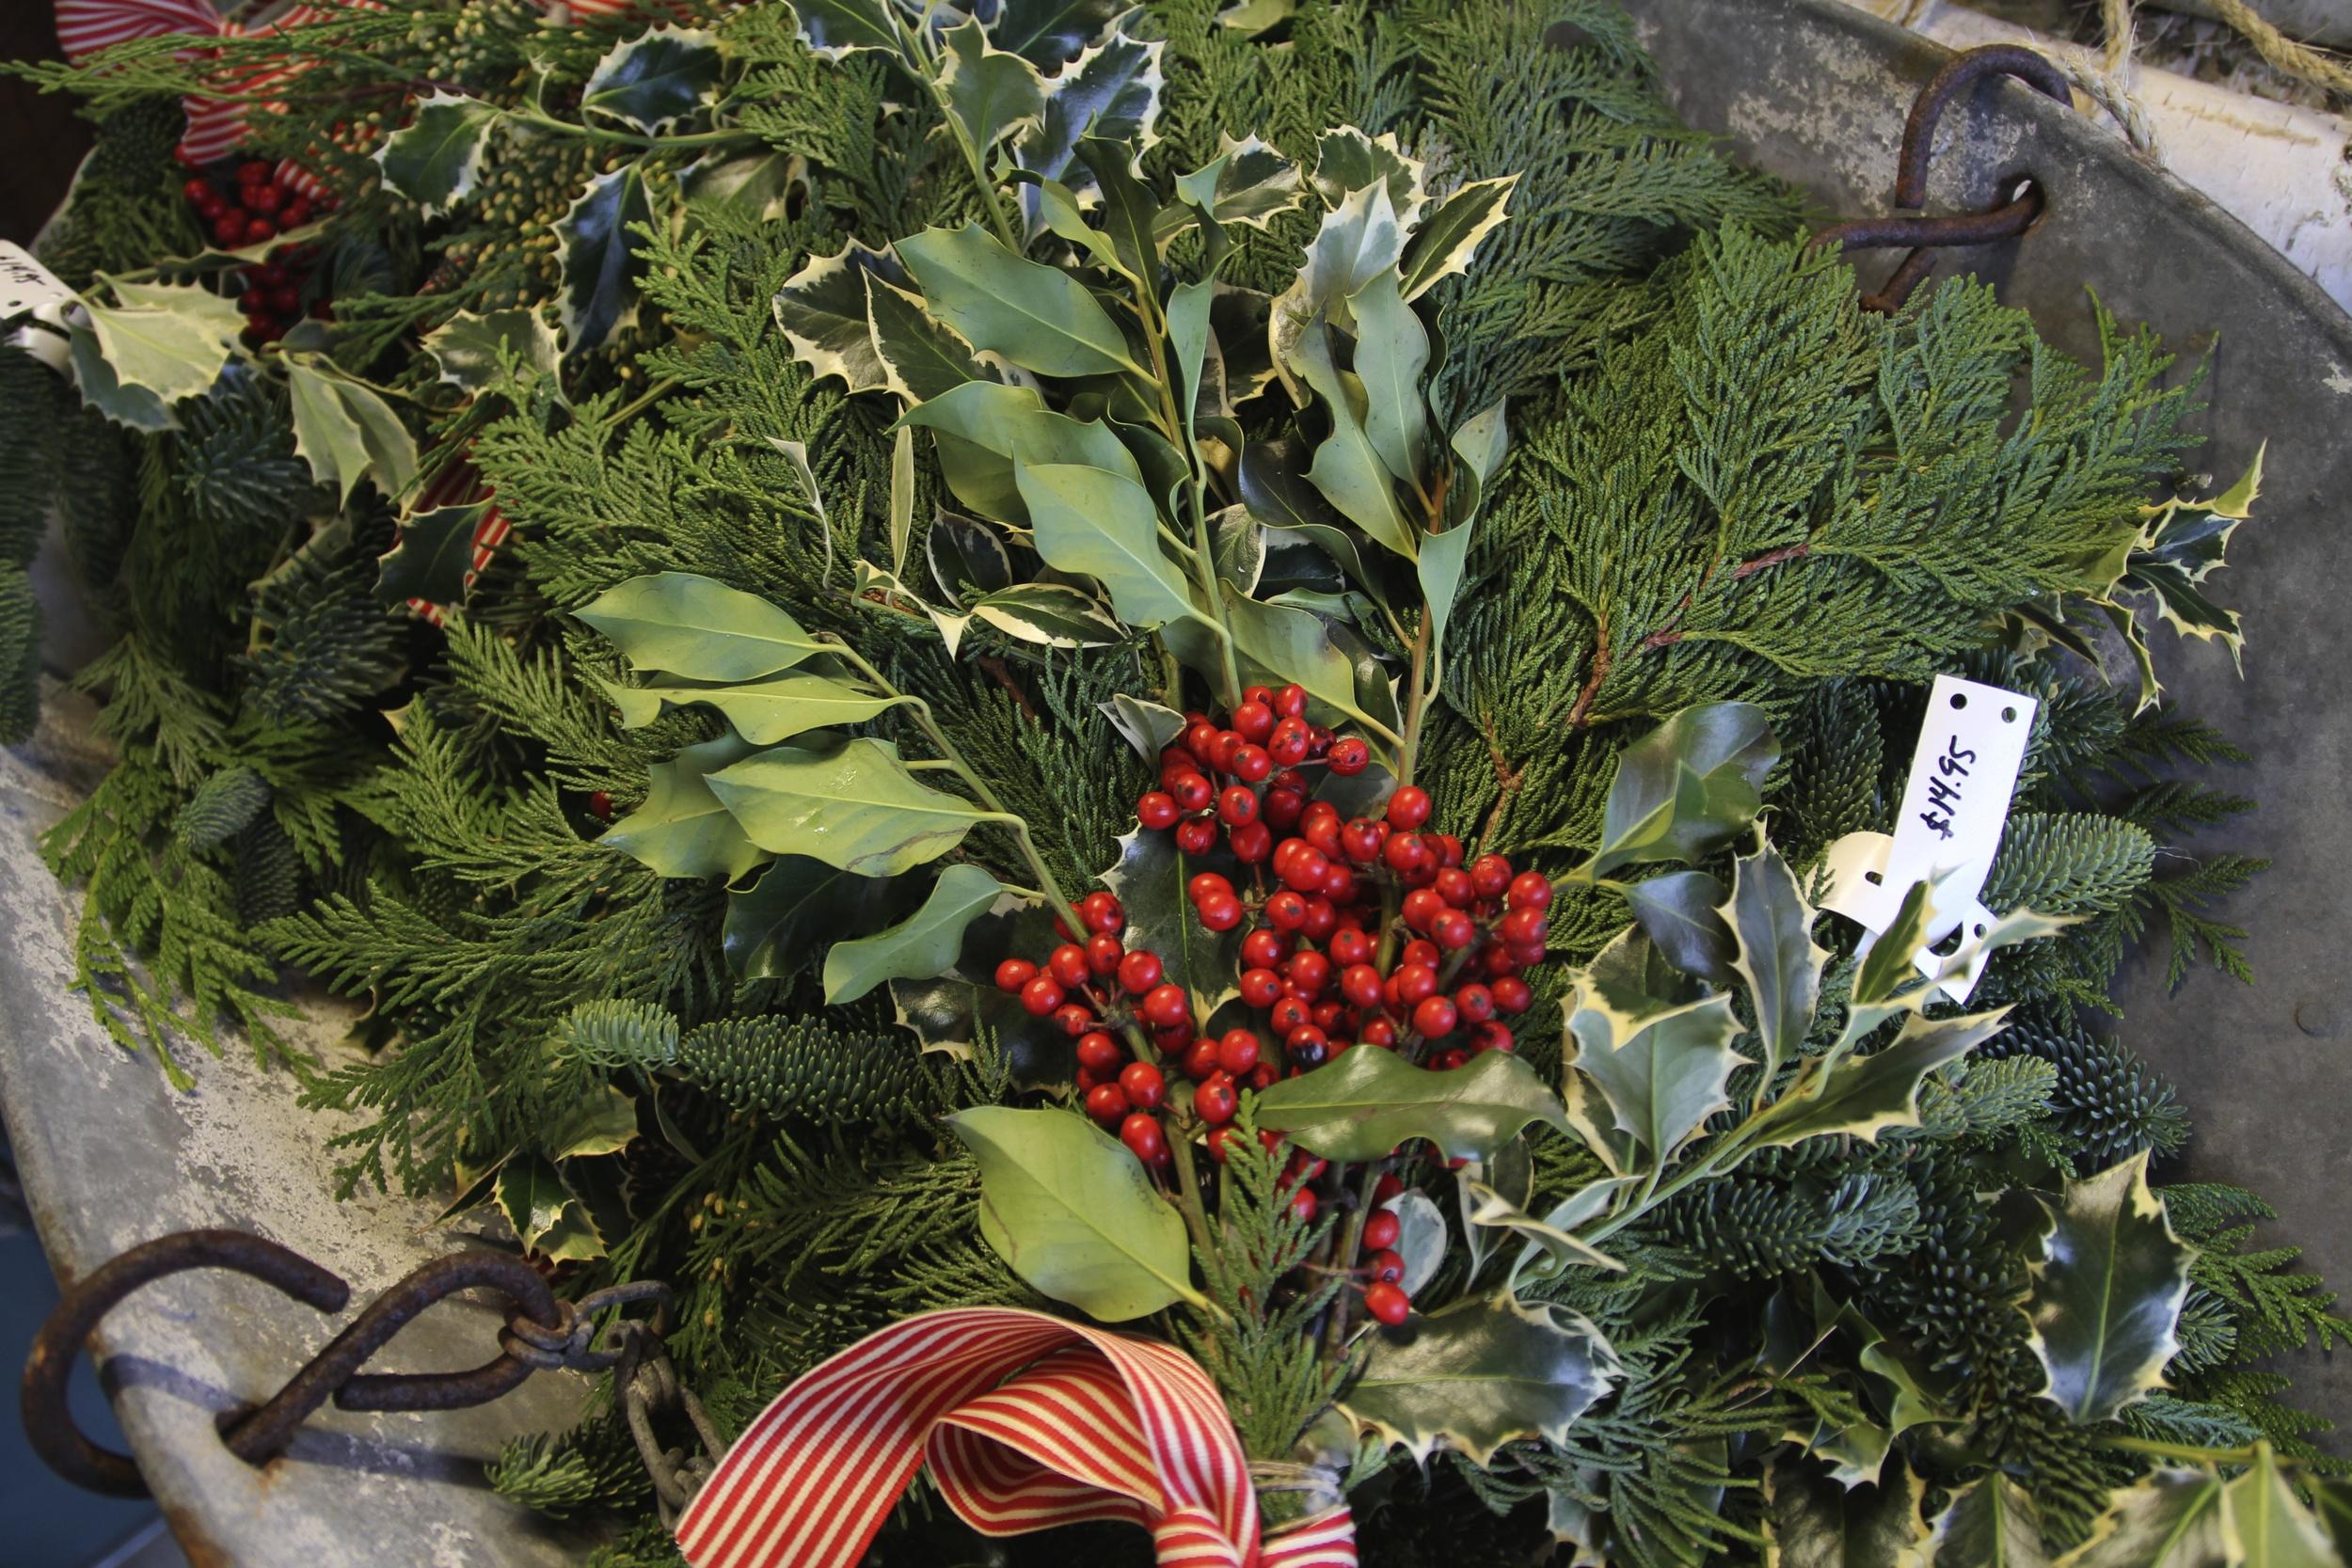 {Festive greenery at a local farmer's market}